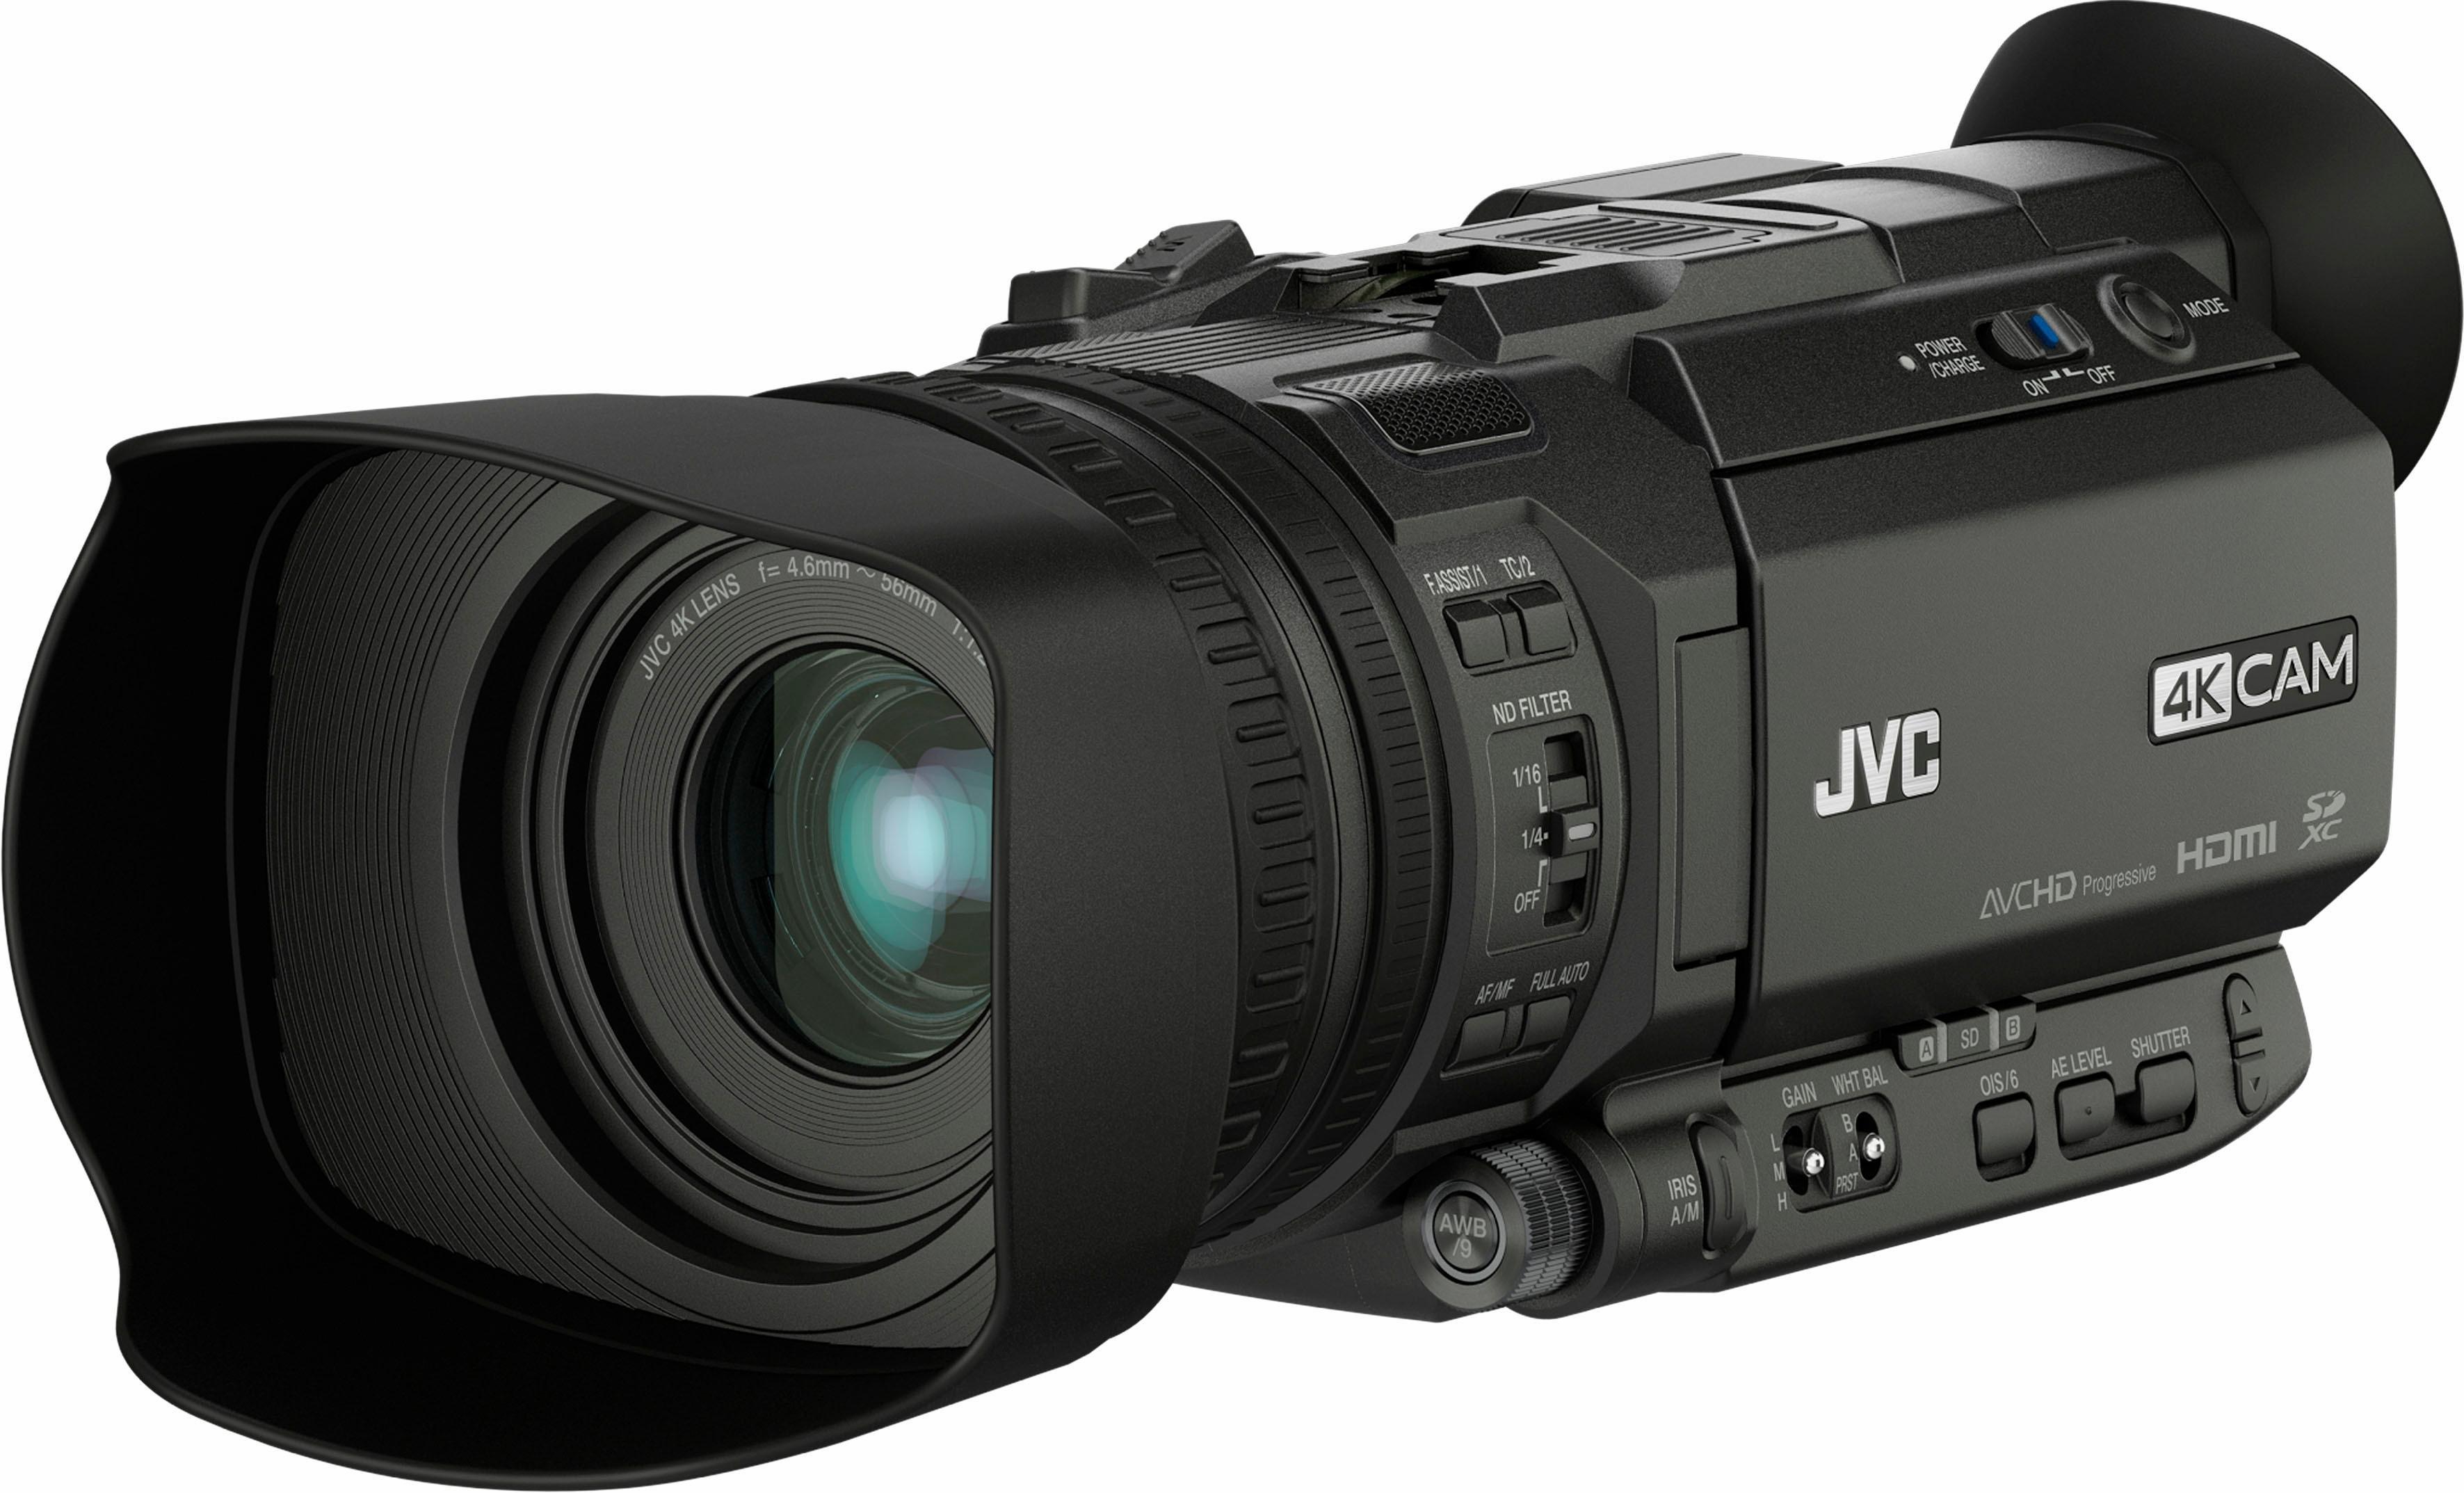 JVC GY-HM170E inclusief handgreep (KA-HU1) 4K (Ultra HD) camcorder - verschillende betaalmethodes